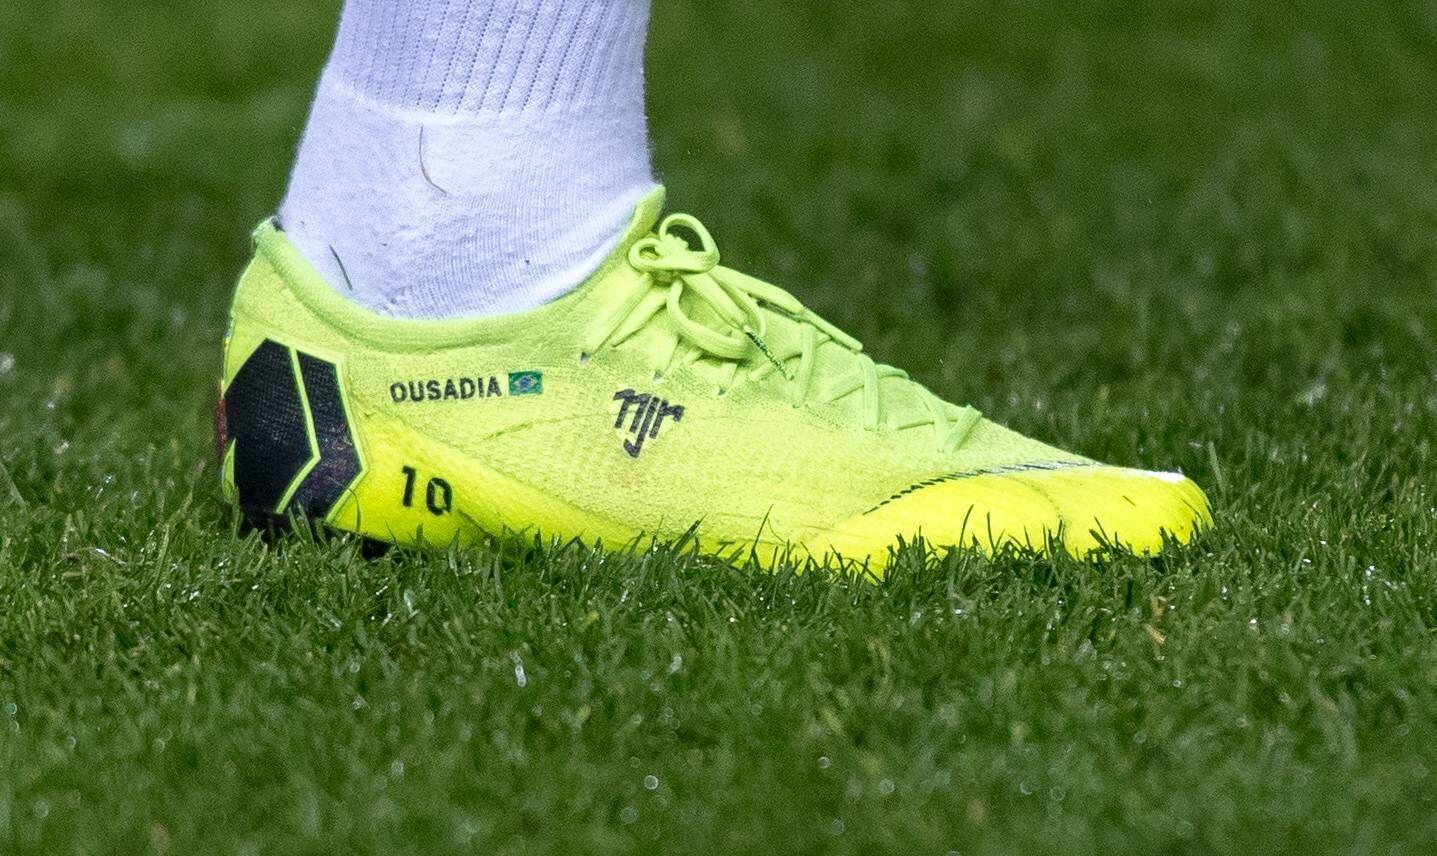 The nike mercurial football boot of Neymar Paris Saint Germain of Brazil pre match displaying OUS